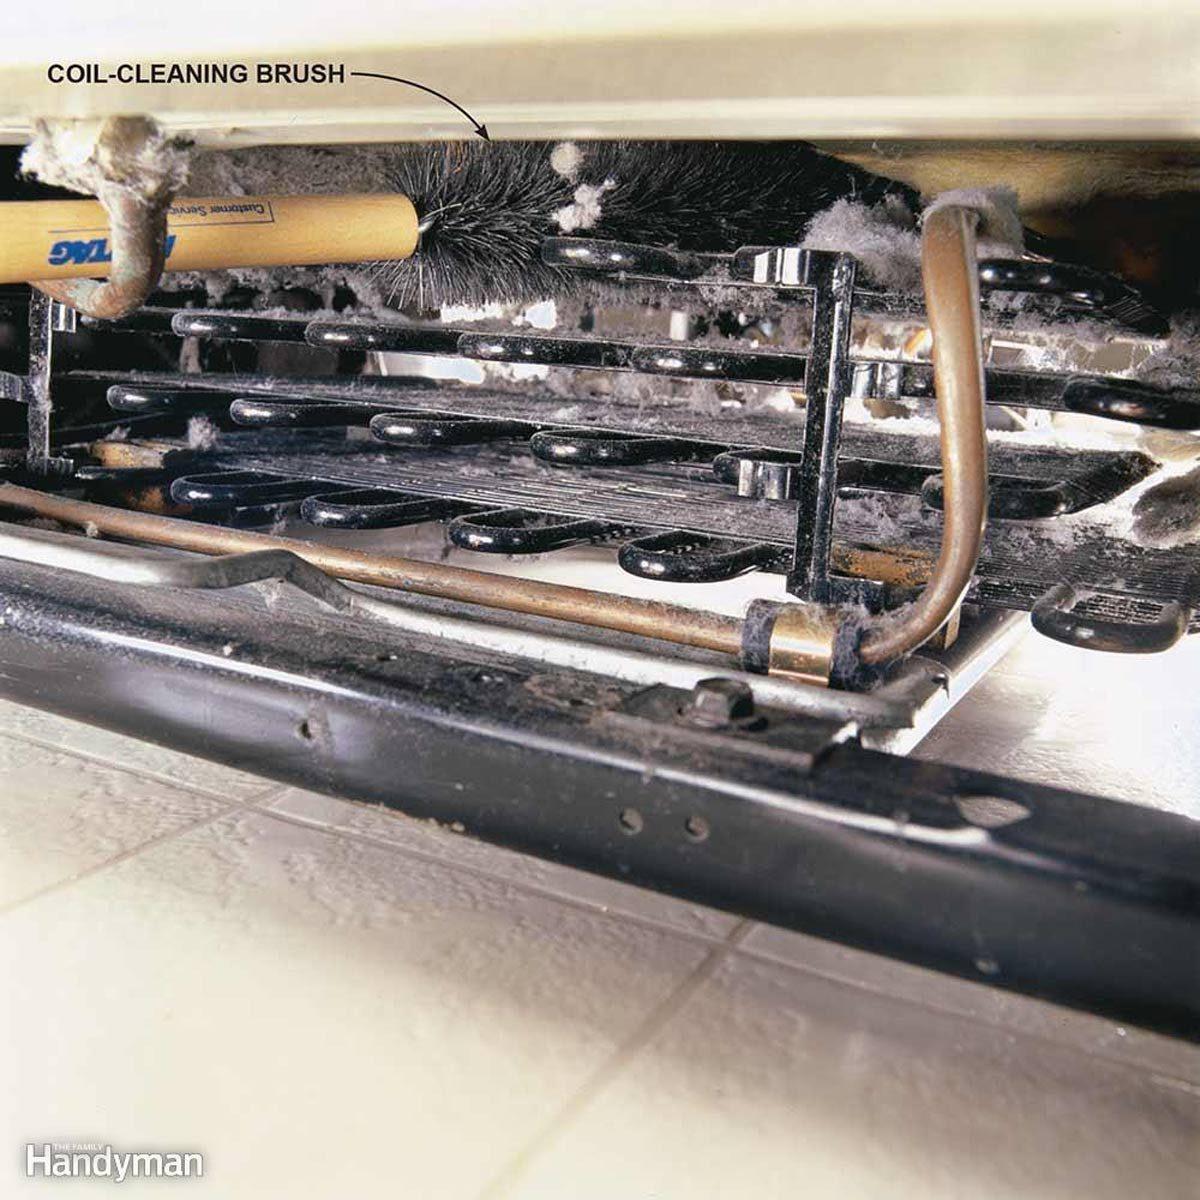 clean-refrigerator coils